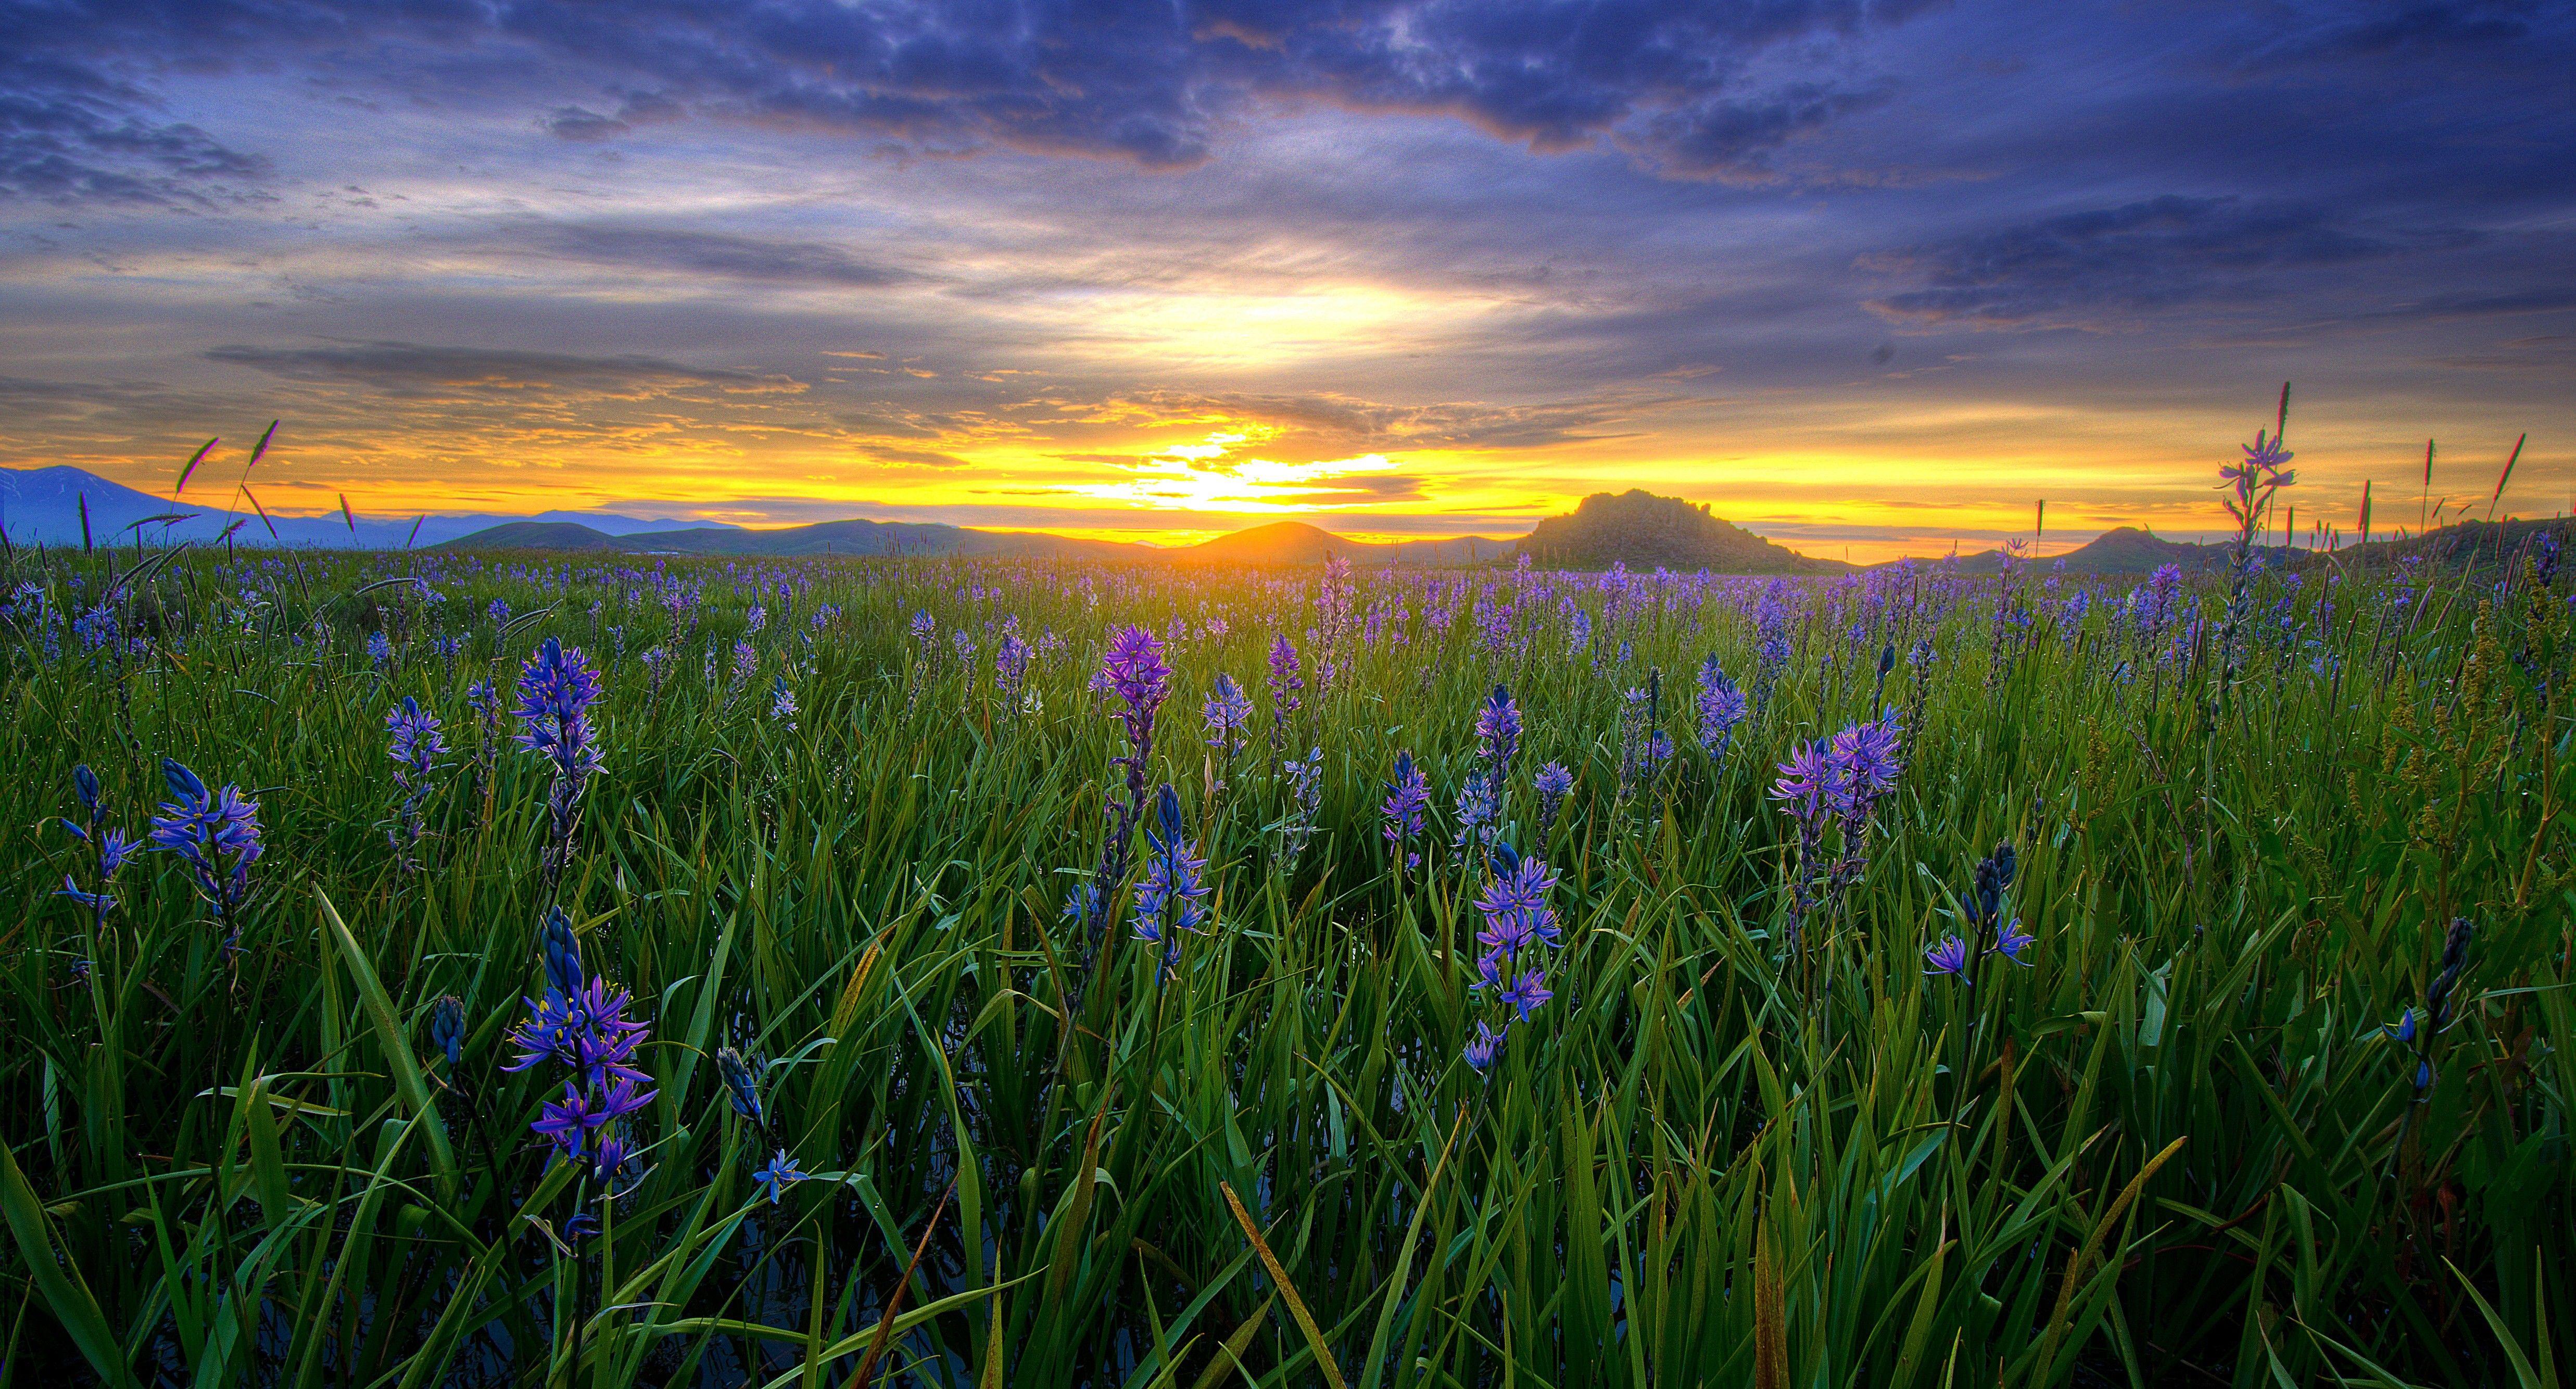 Small purple flowers fill a field under a sunset.